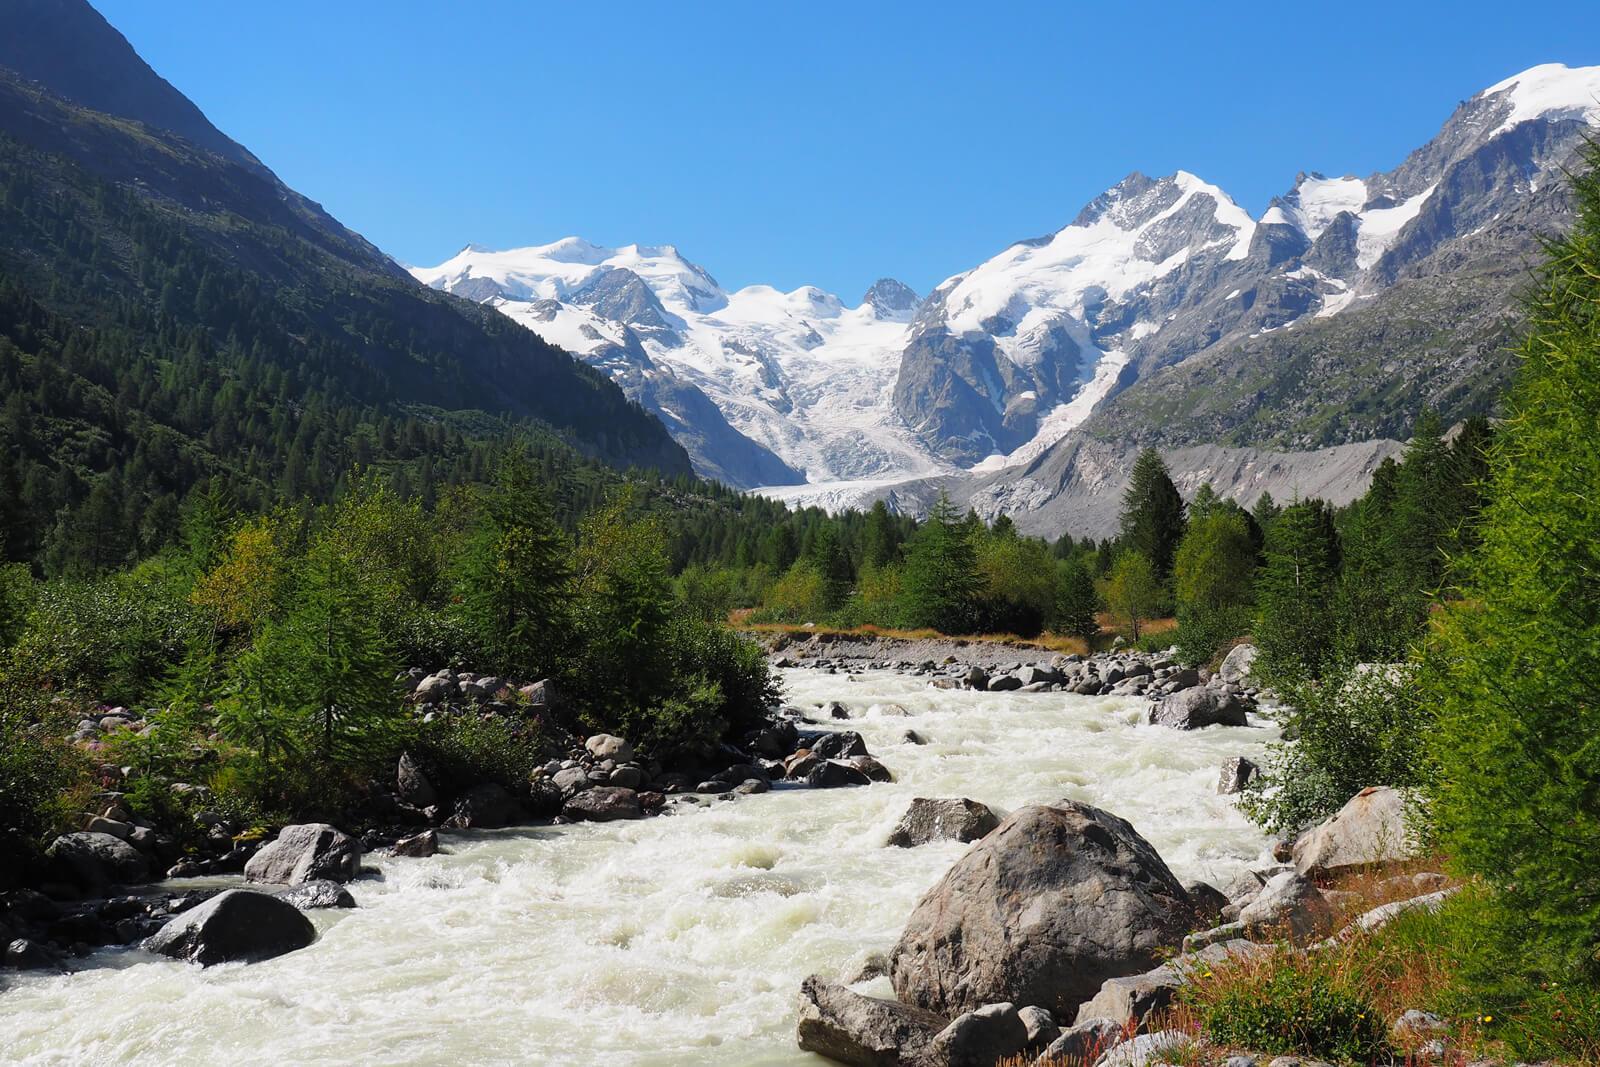 Morteratsch Glacier Trail in Pontresina